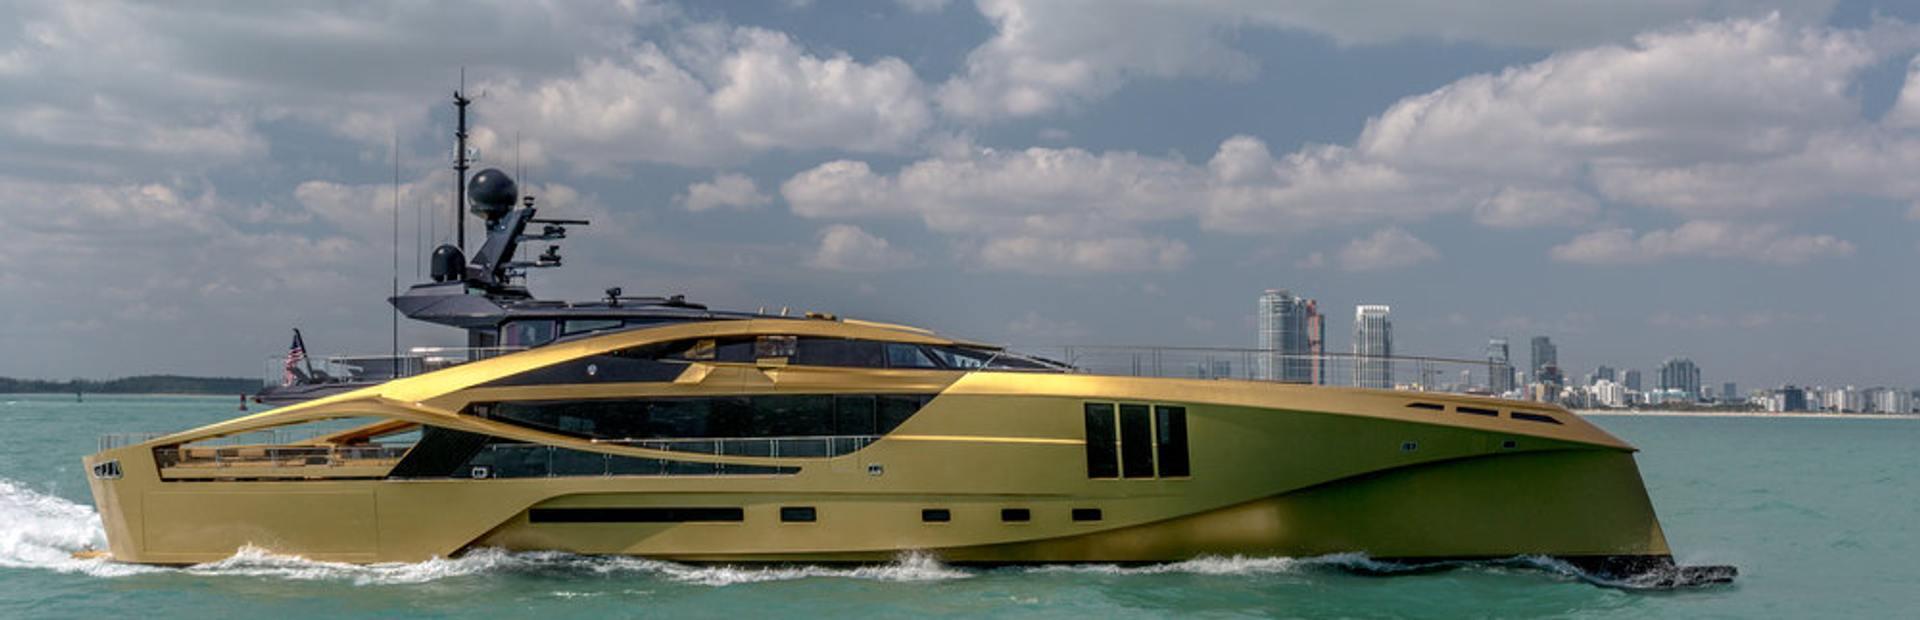 Palmer Johnson 48M SuperSport Yacht Charter